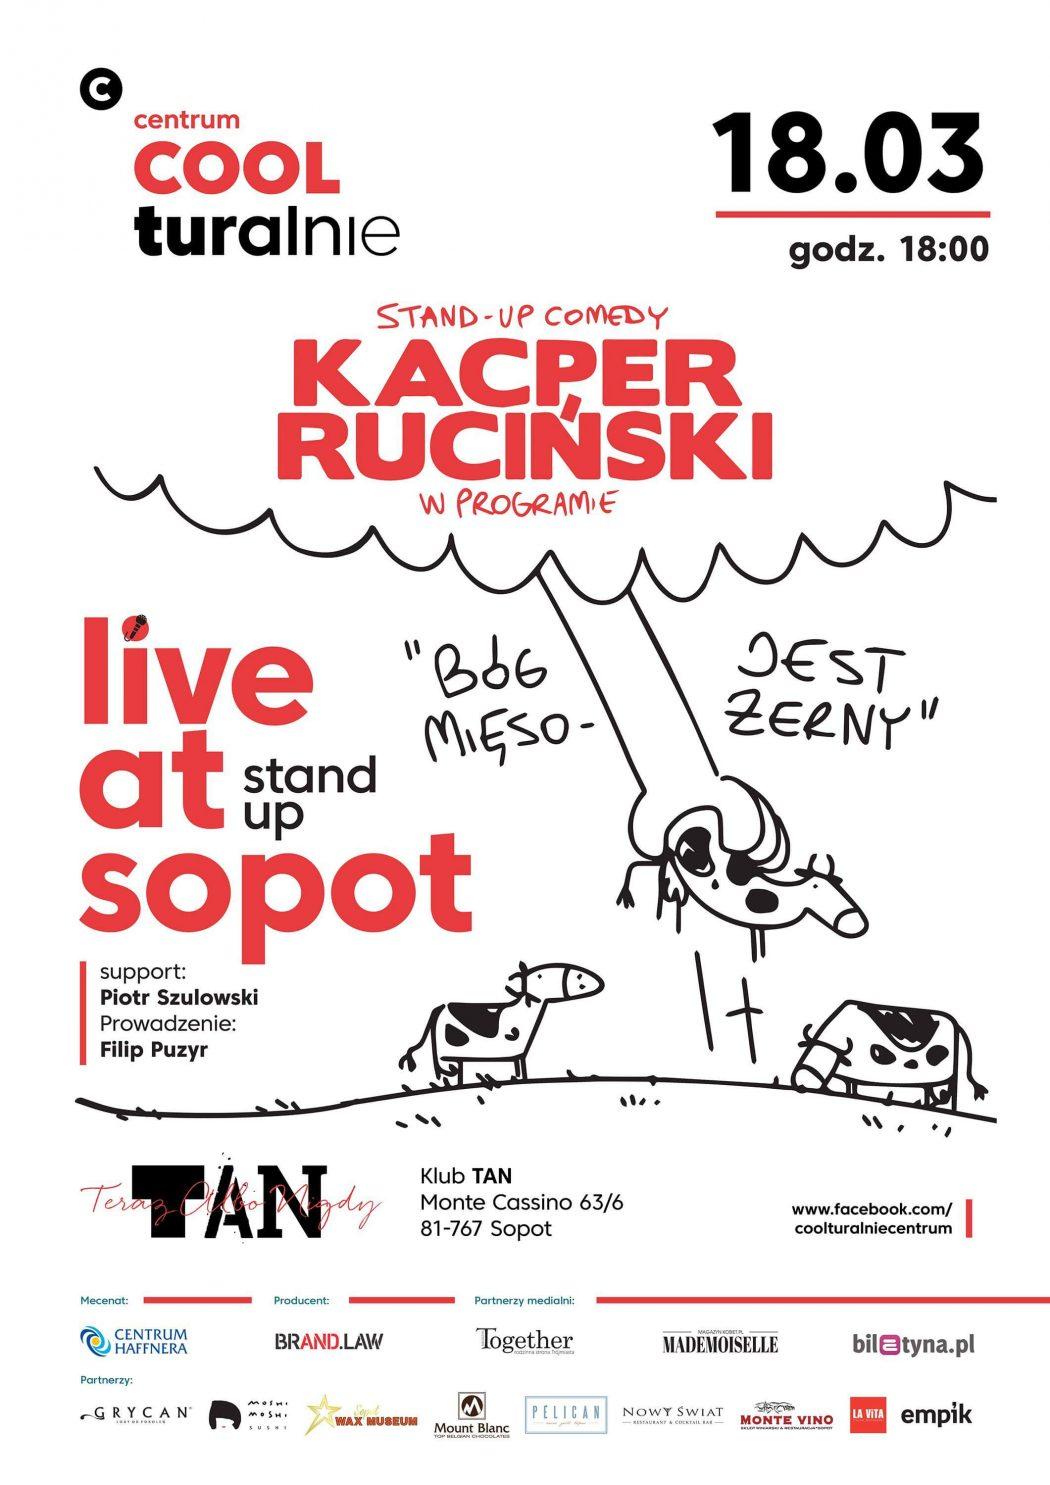 magazynkobiet.pl - received 2339717912720372 1050x1485 - Live at Sopot - Kacper Ruciński + Piotr Szulowski/Filip Puzyr